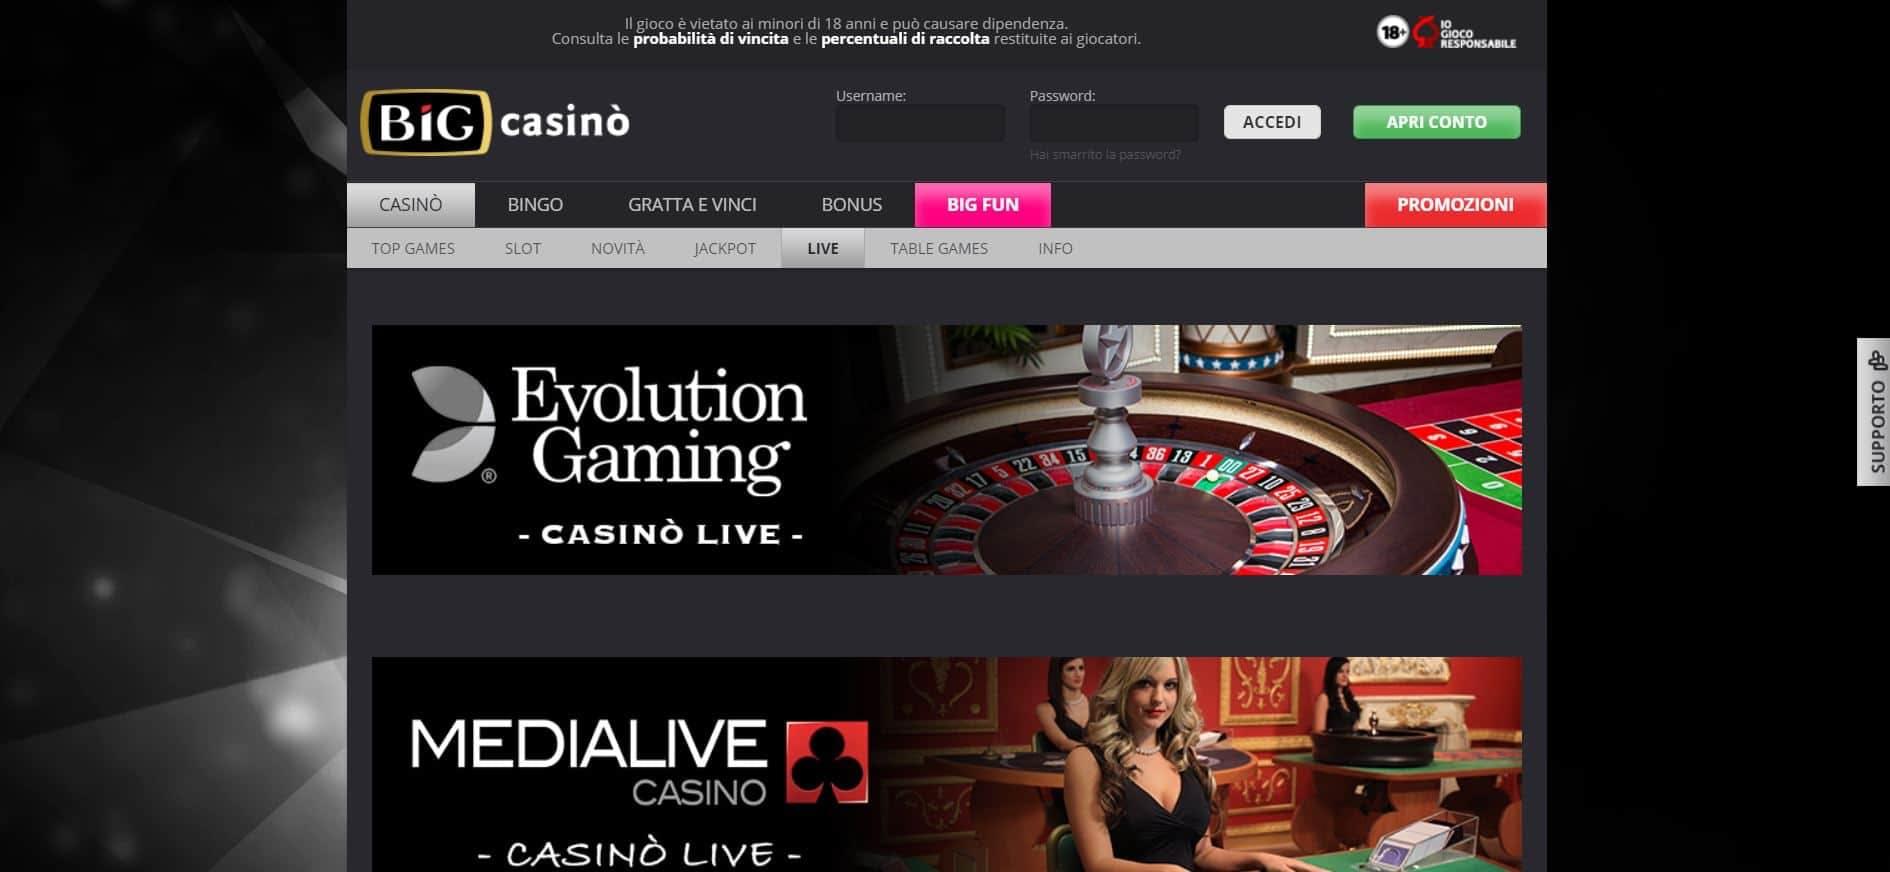 Il casino dal vivo diBIG Casinopresenta diversi tavoli virtuali